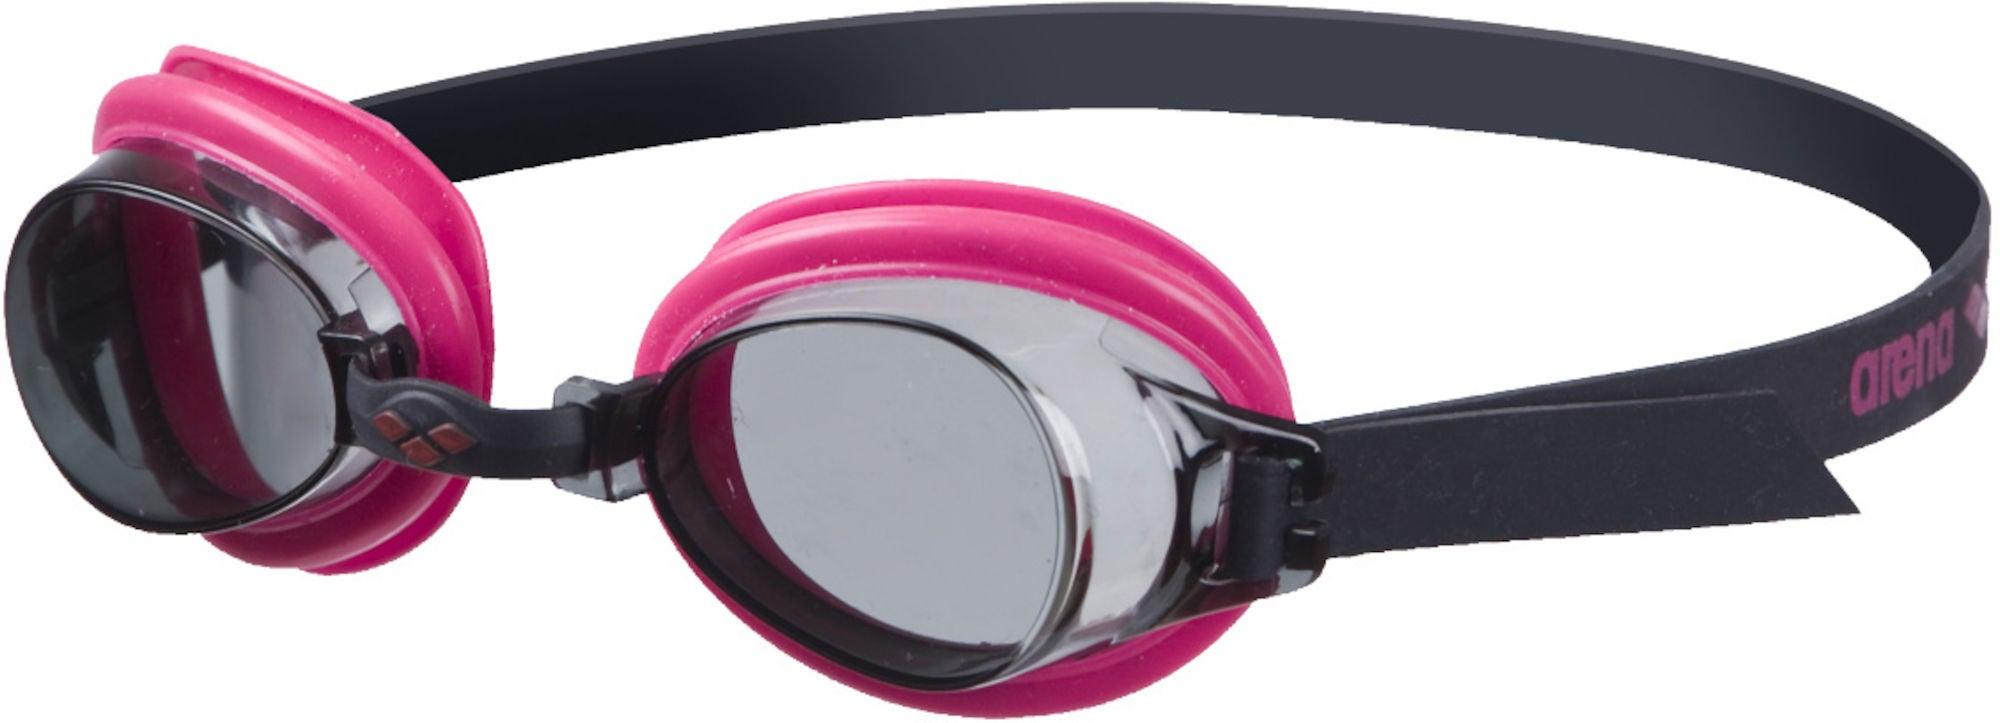 0a0d349ad80 Kjøp Arena Bubble 3 JR Svømmebriller, Svart/Rosa | Jollyroom